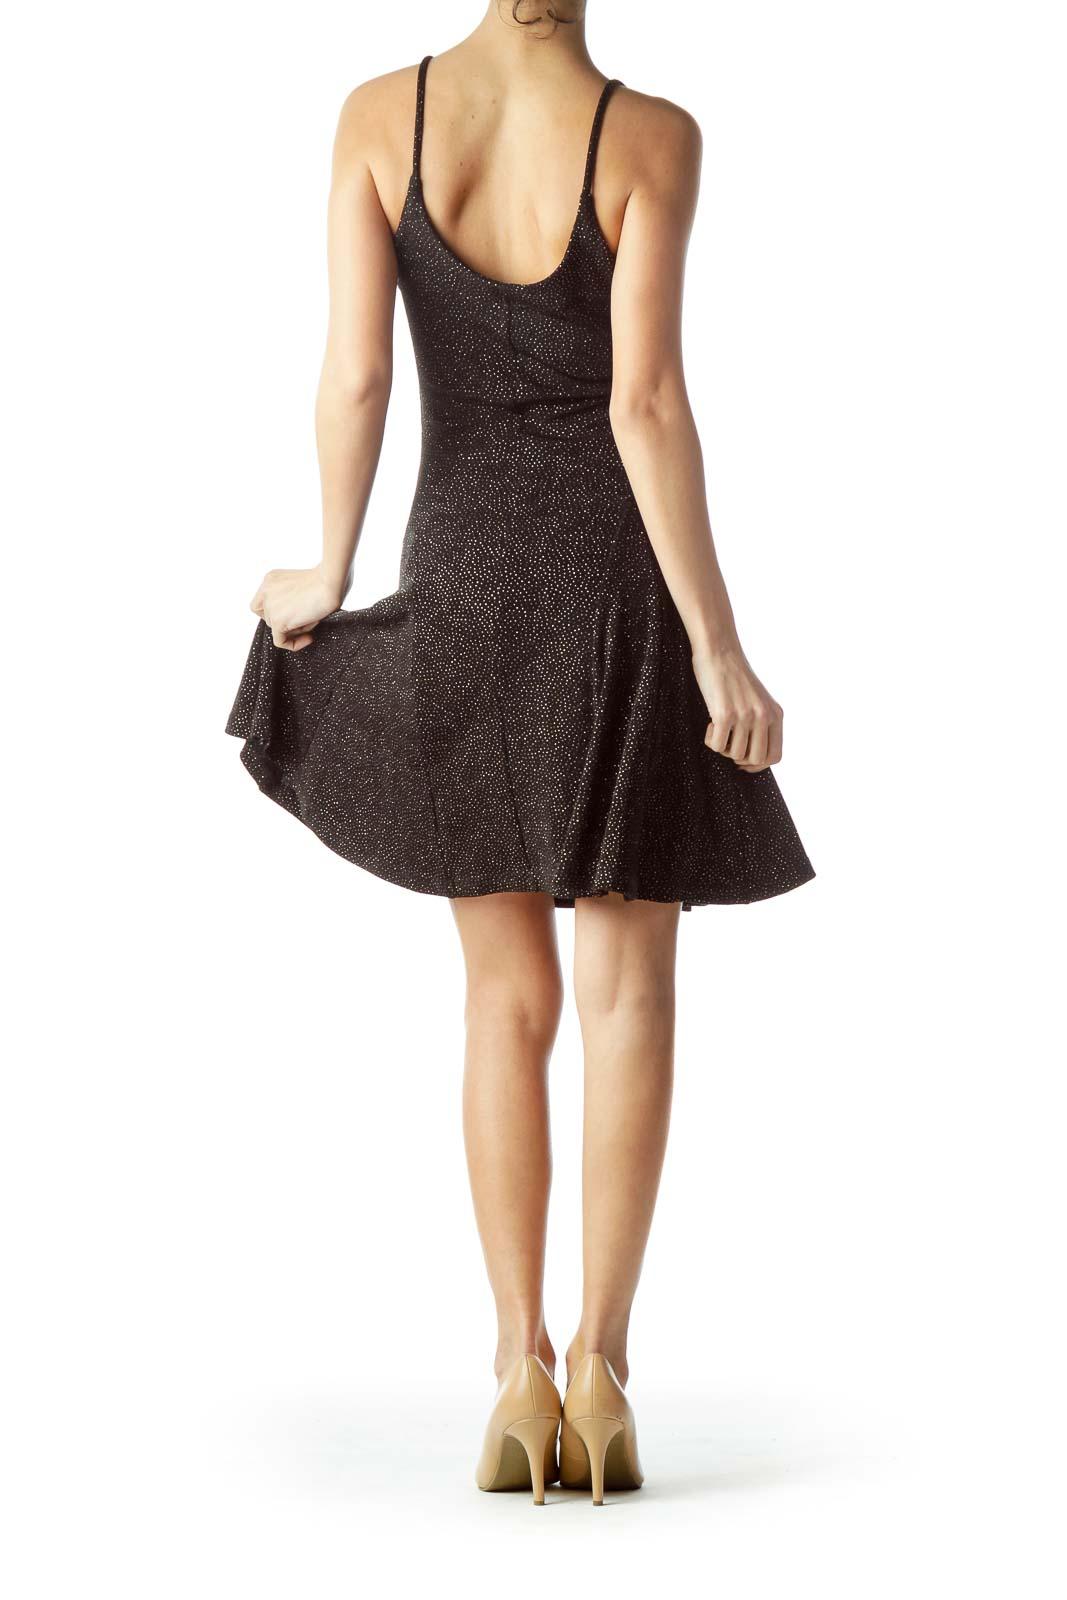 Black Tiny Gold Dots on Body Flared Dress